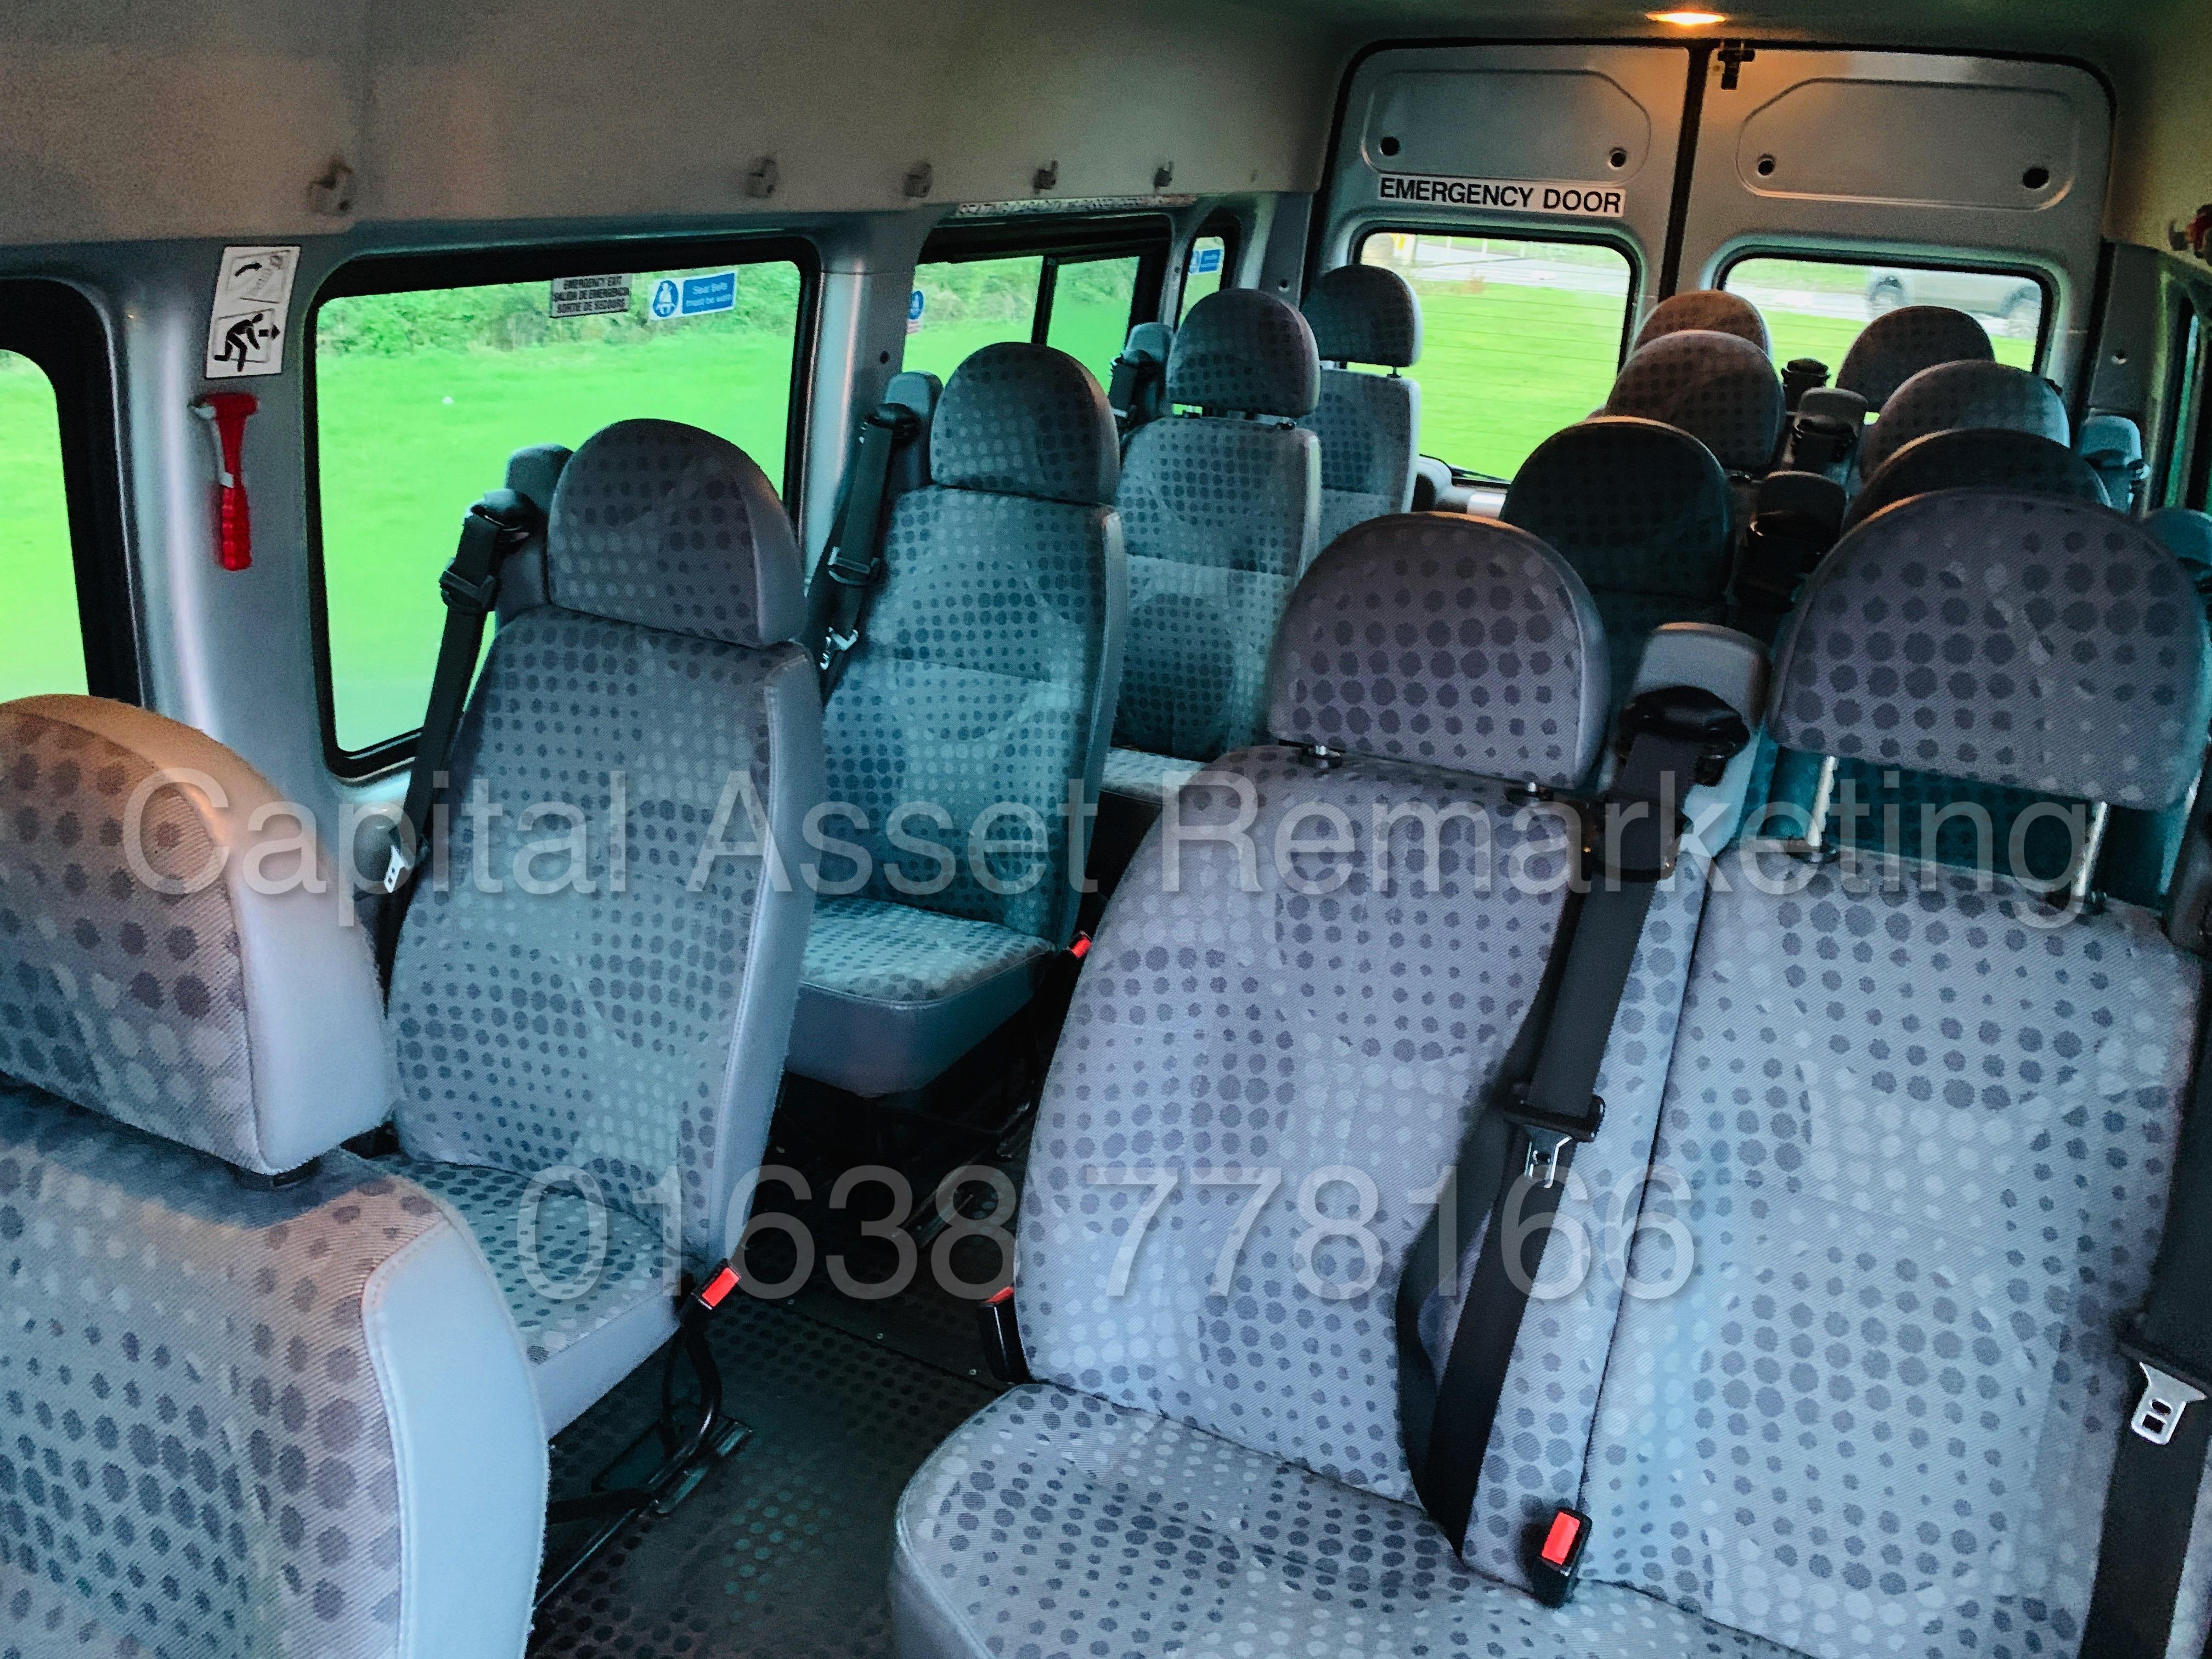 FORD TRANSIT 135 T430 RWD *XLWB -17 SEATER MINI-BUS* (2013) '2.2 TDCI - 135 BHP - 6 SPEED' (1 OWNER) - Image 26 of 43